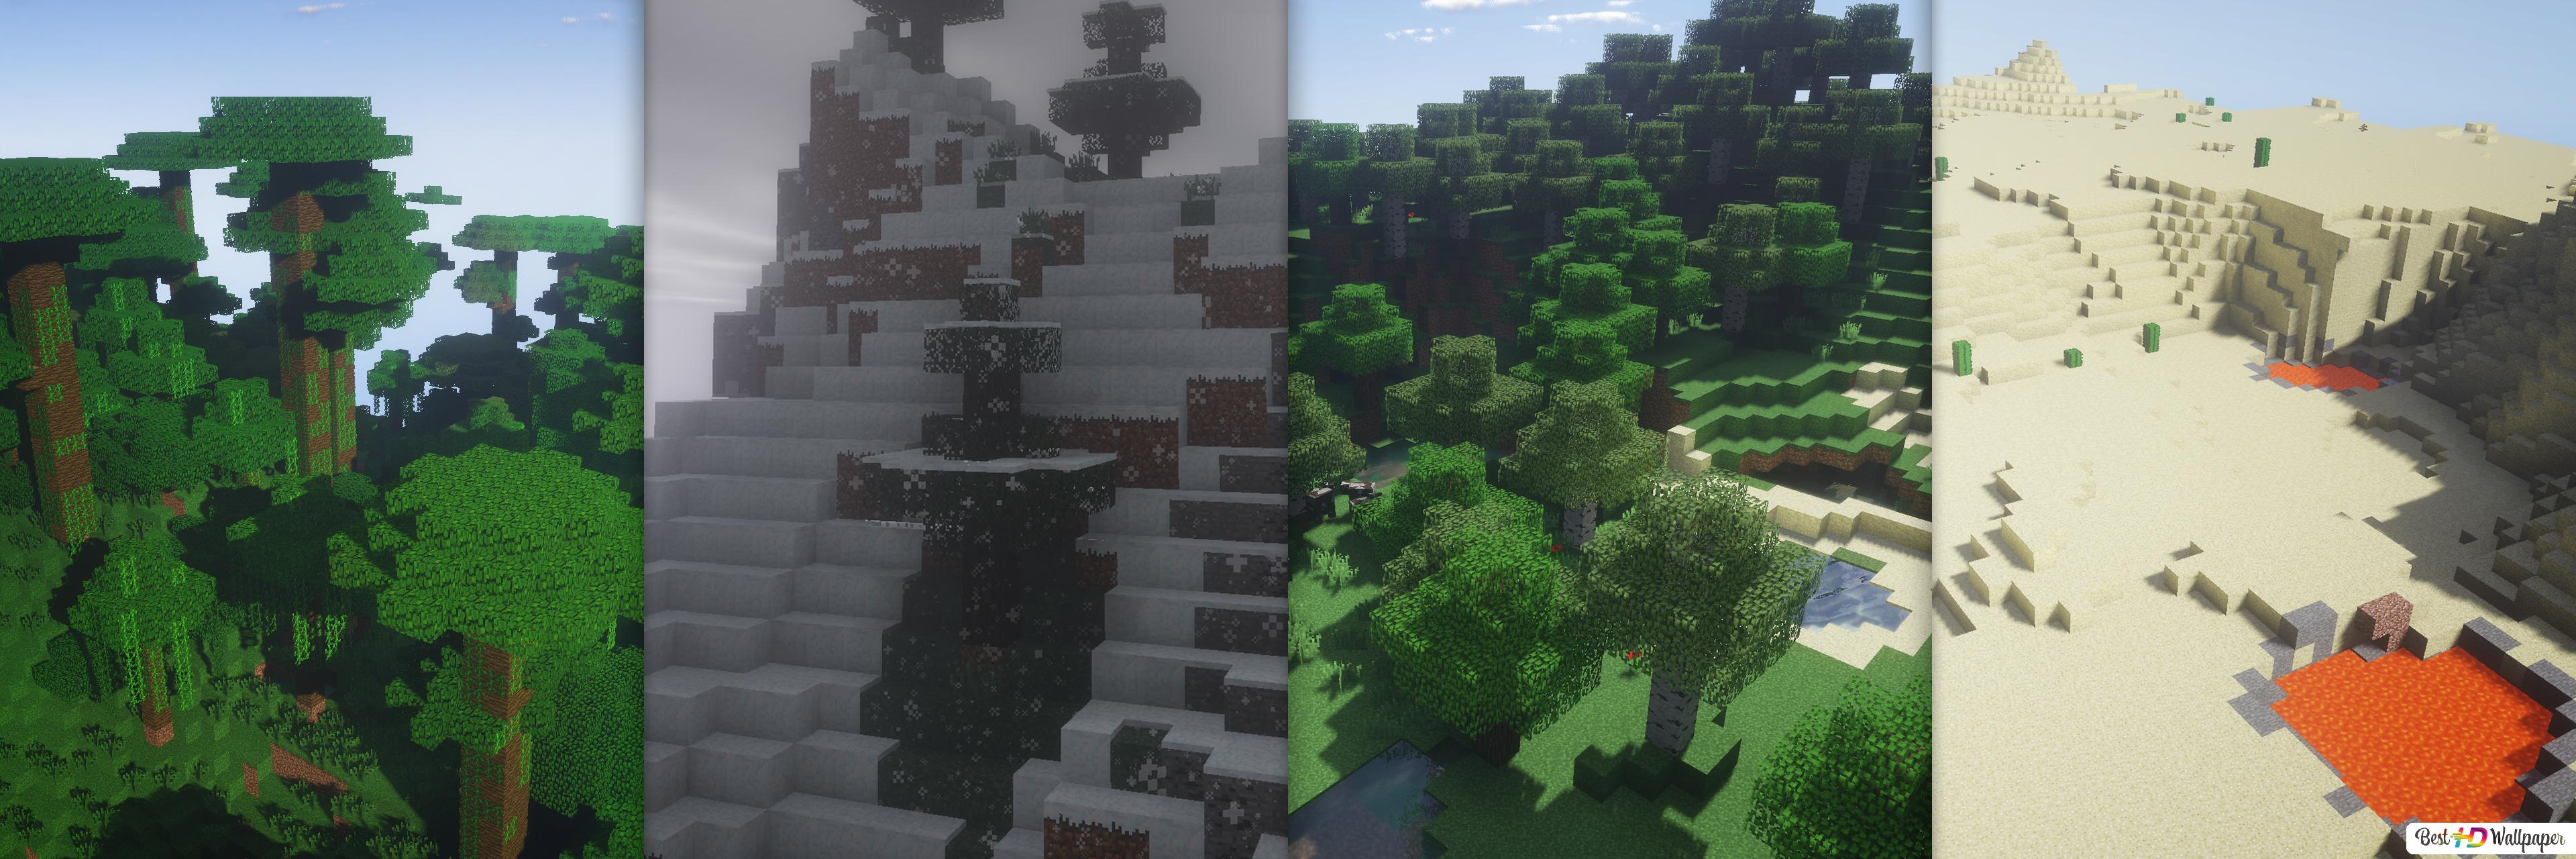 Minecraft Landscape Hd Wallpaper Download